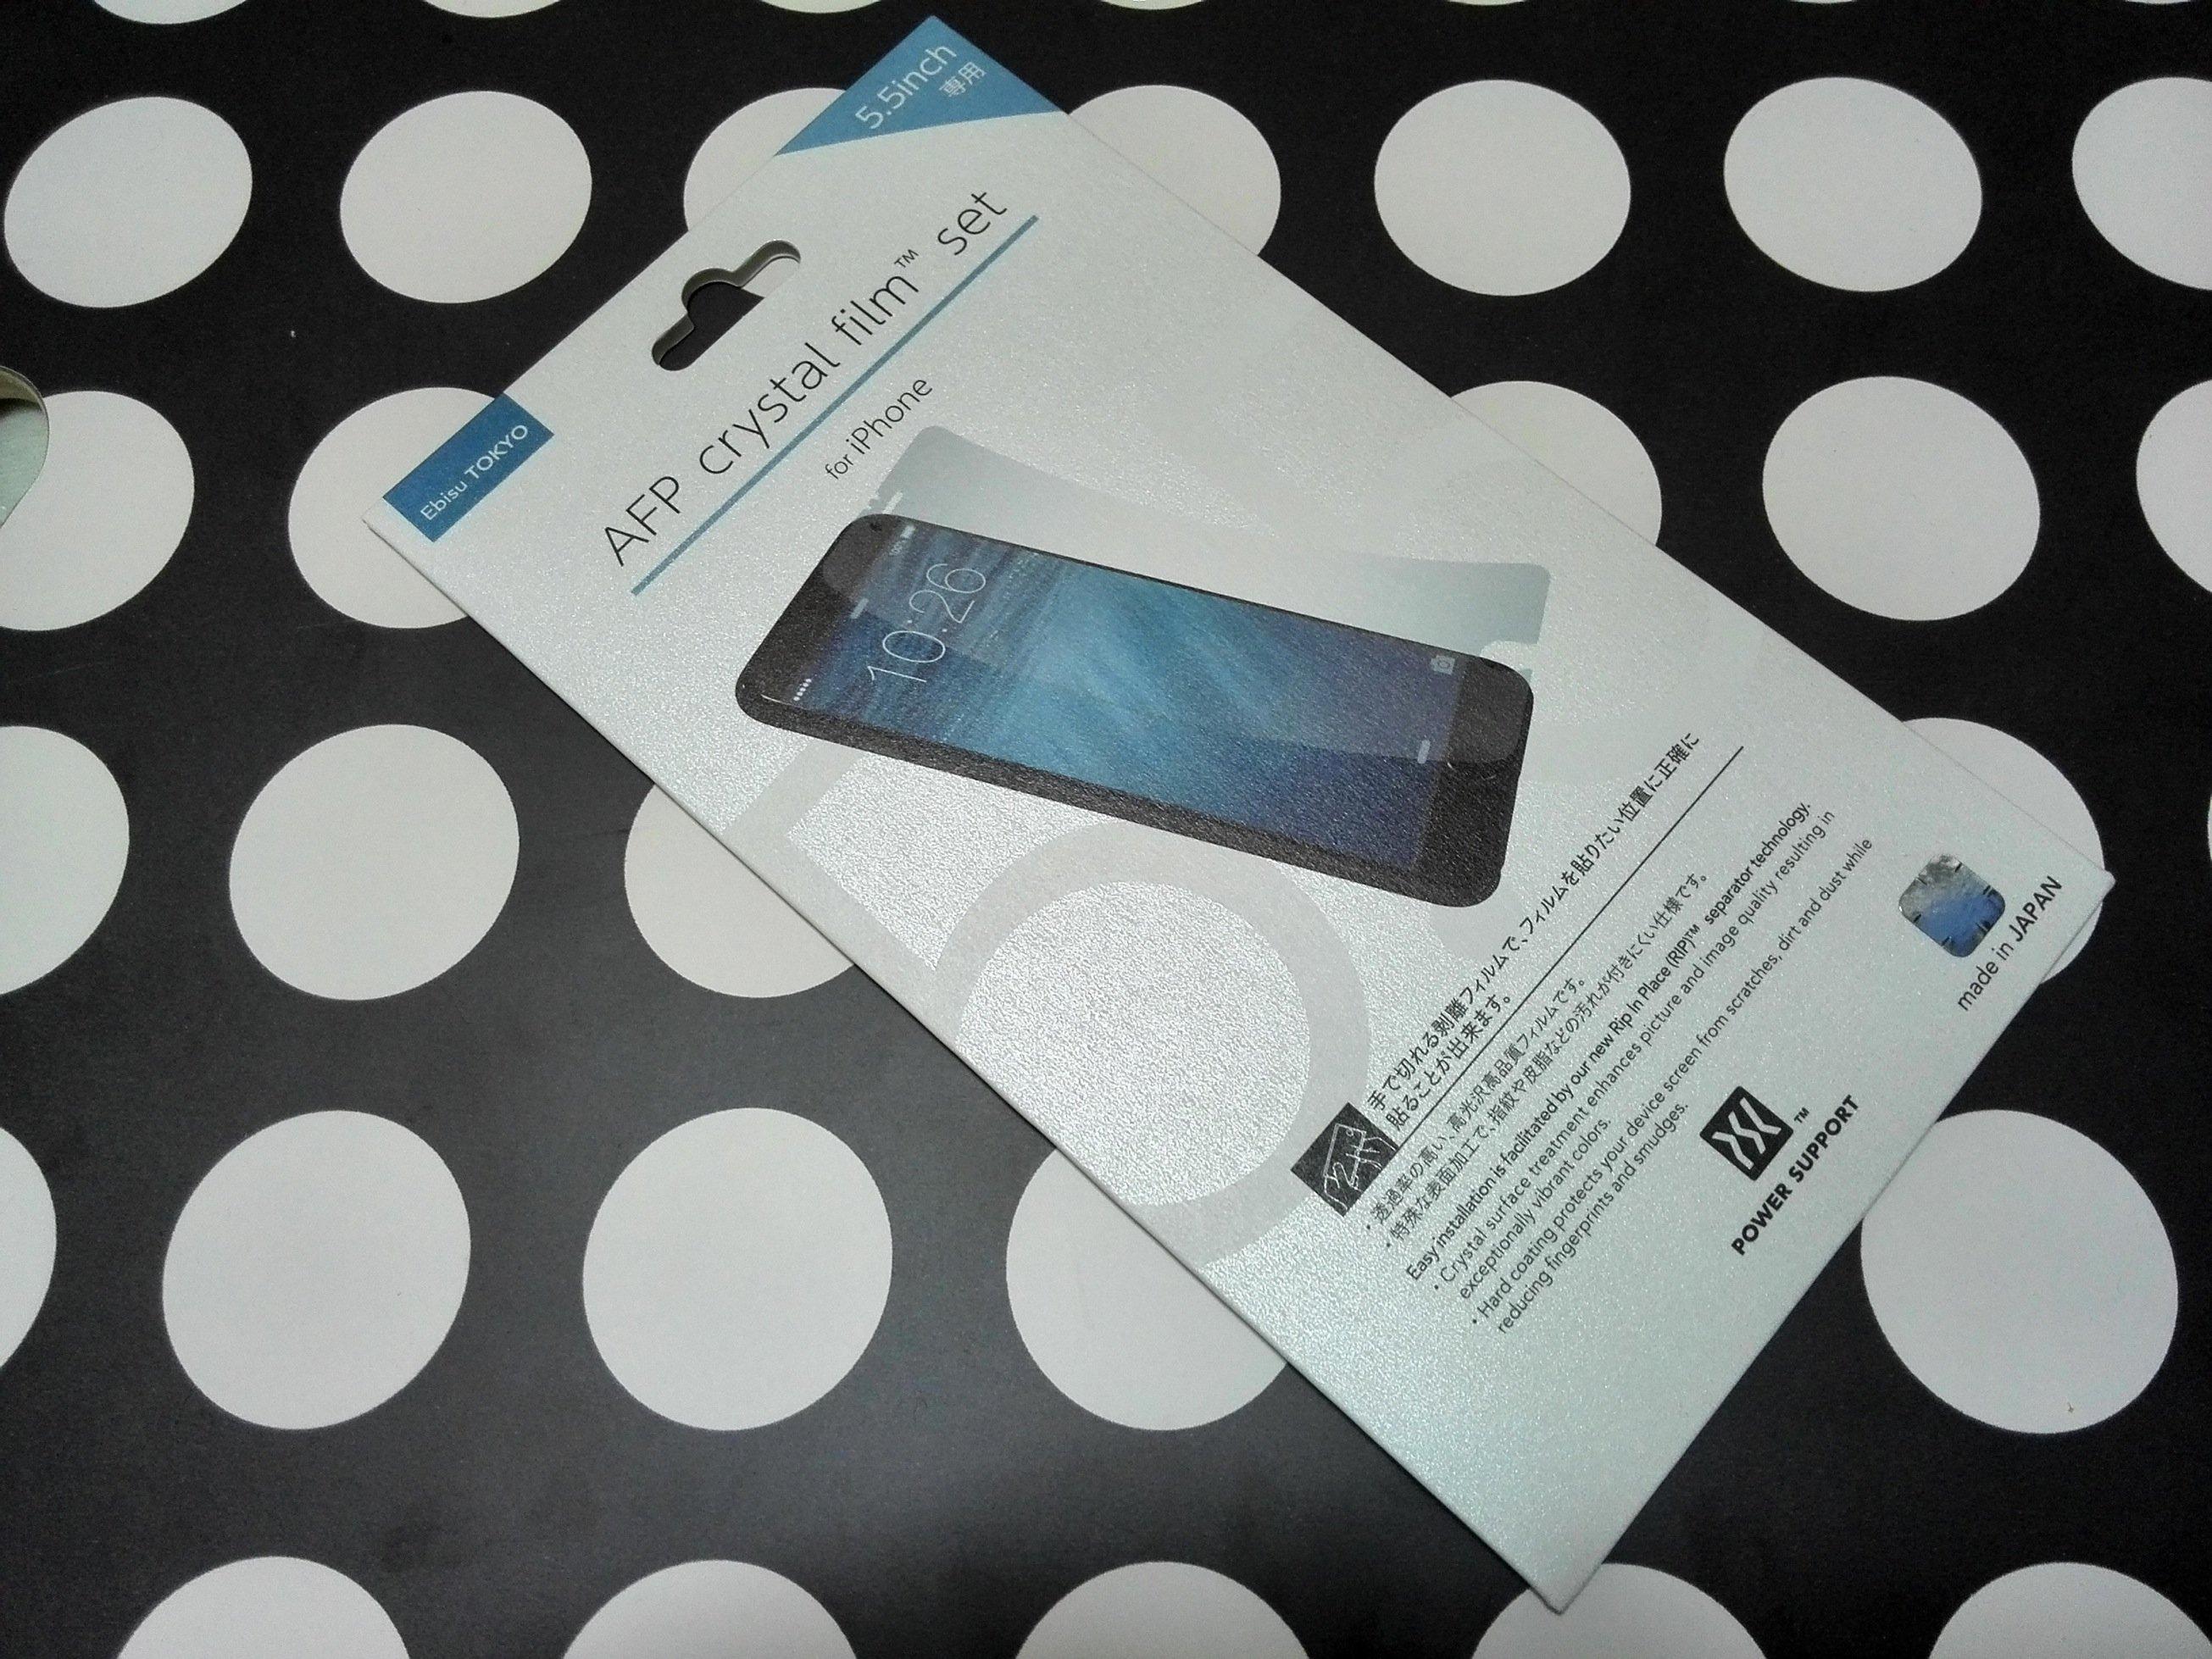 288e7e0d3d iPhone 6 Plusレビュー。液晶保護フィルムをパワーサポートAFPクリスタルフィルムセット for iPhone6 にアップデート。 |  しま☆りん.blog @ayurina